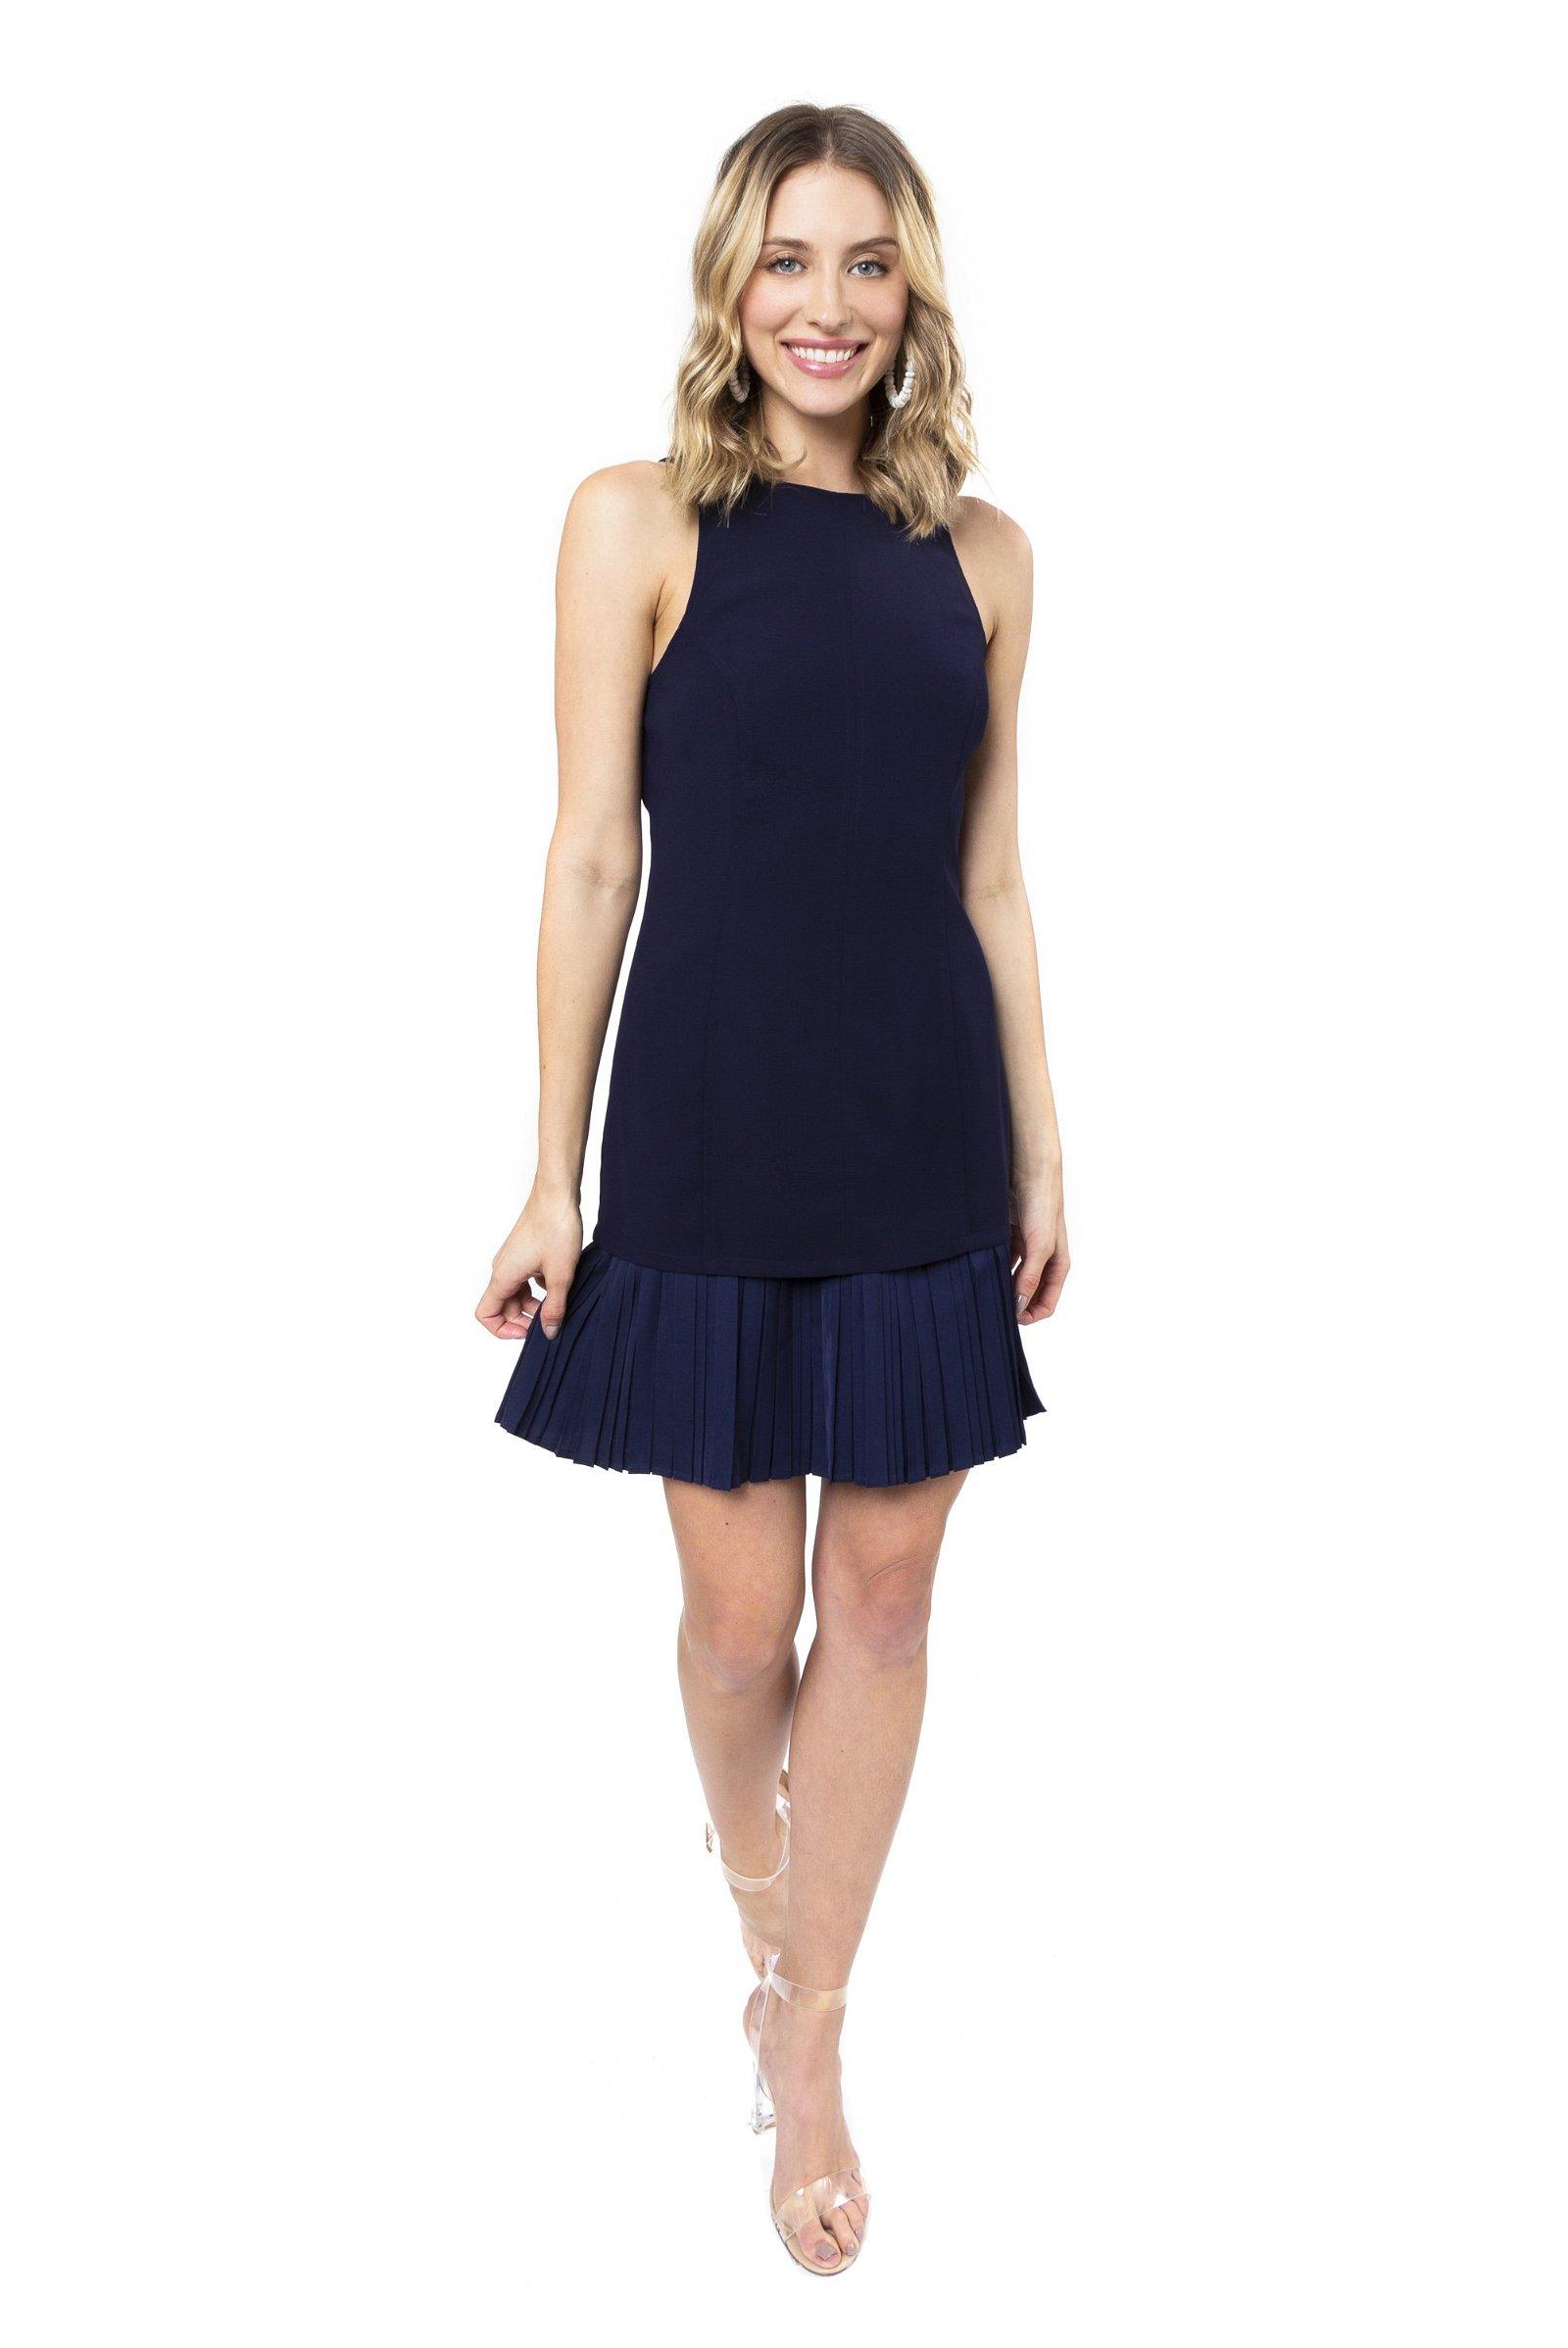 Zyra Dress